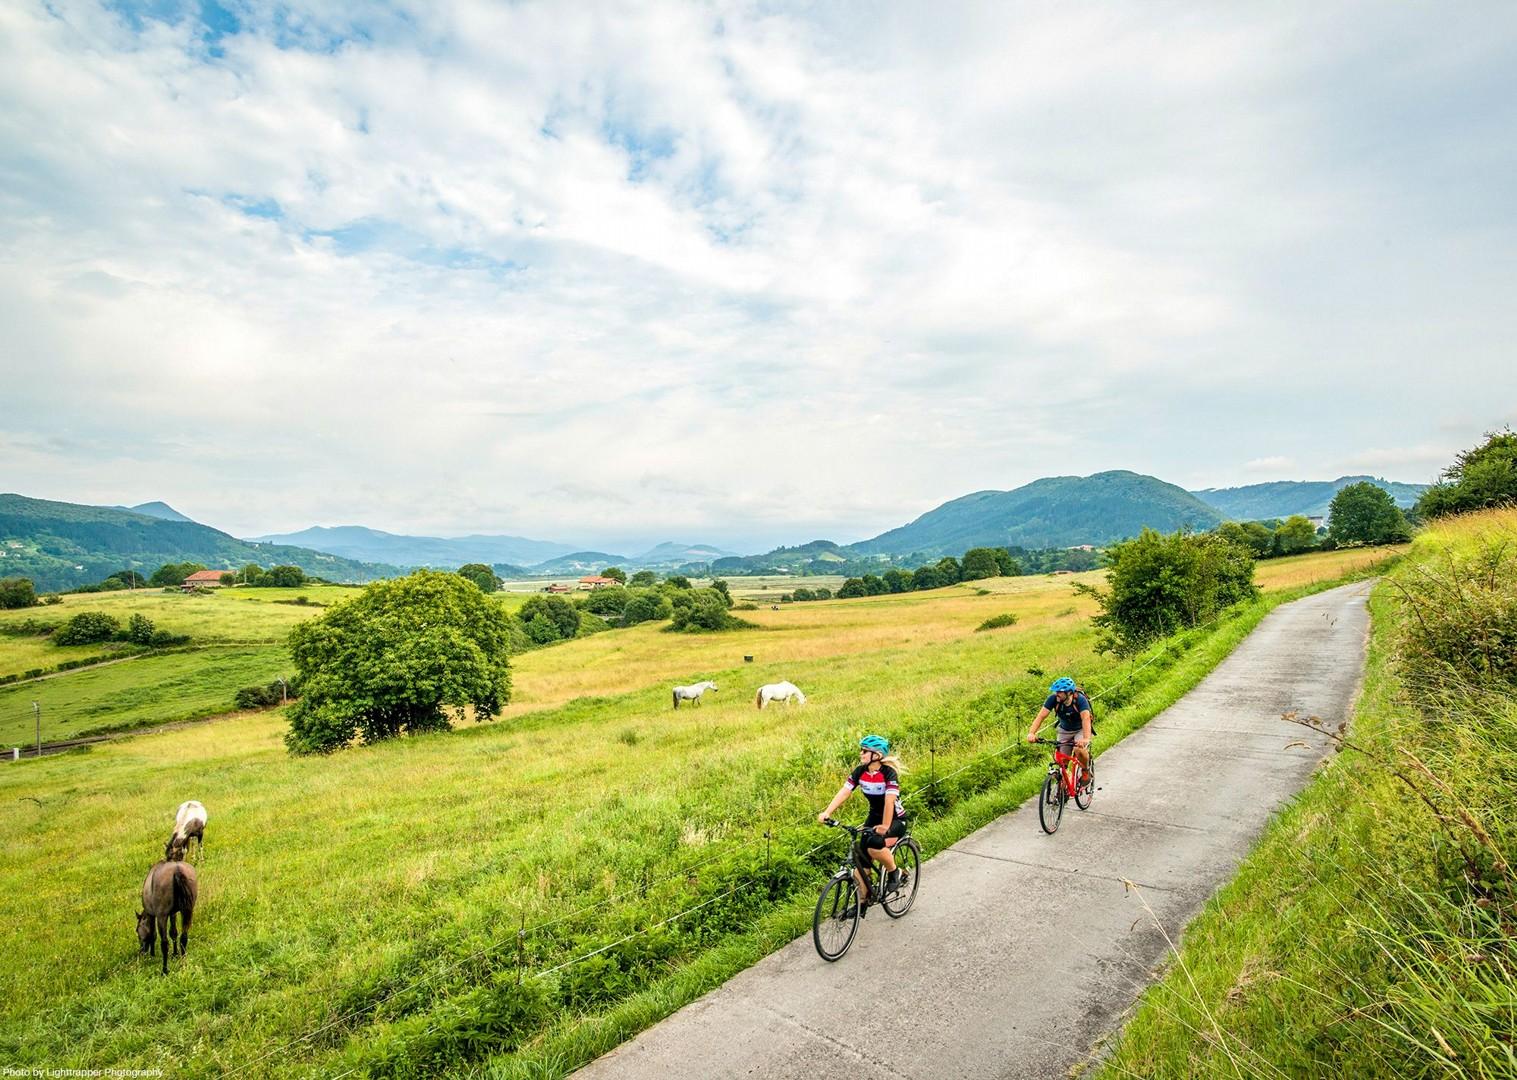 saddle-skedaddle-spain-leisure-cycling-bilbao-to-san-sebastian-holiday.jpg - NEW! Spain - Bilbao to San Sebastian - Leisure Cycling